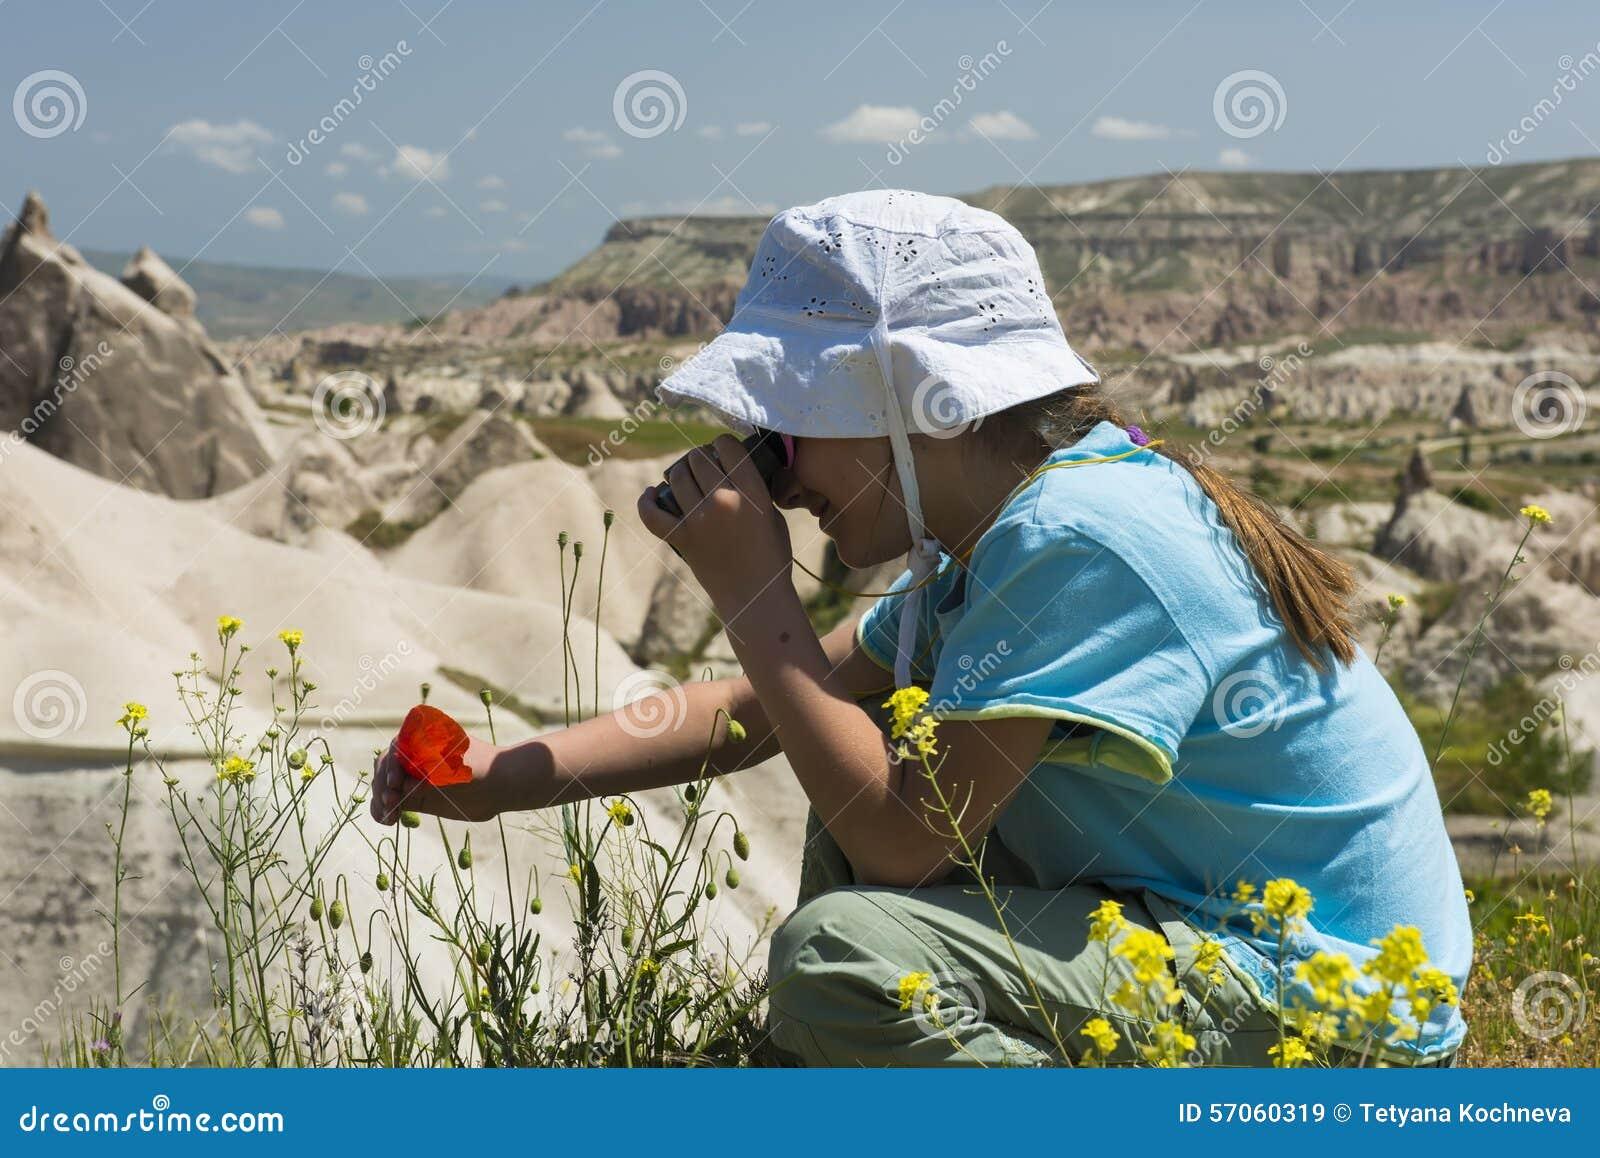 Klein meisje met binoculair in bergen